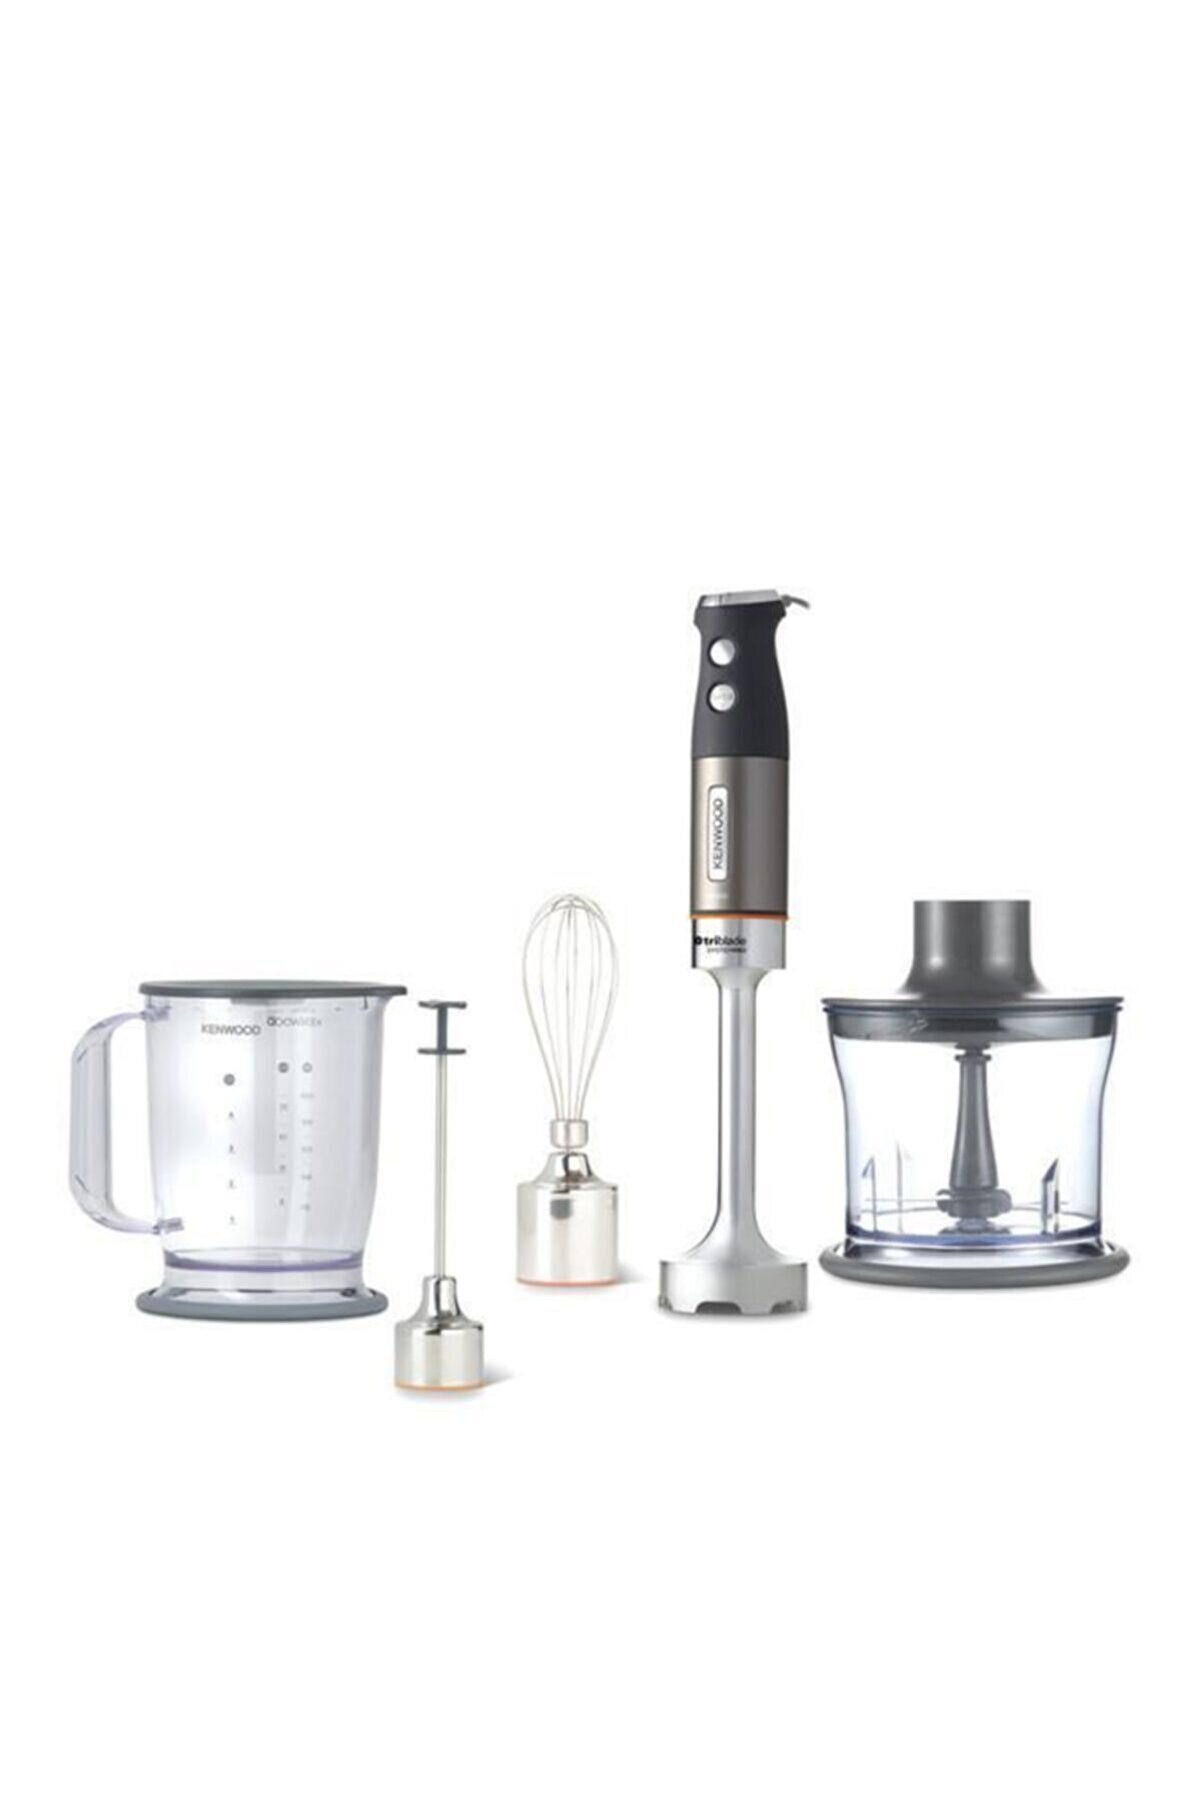 Kenwood Gümüş Patentli 3 Bıçak Hdm804sı 1000 Watt Blender Seti